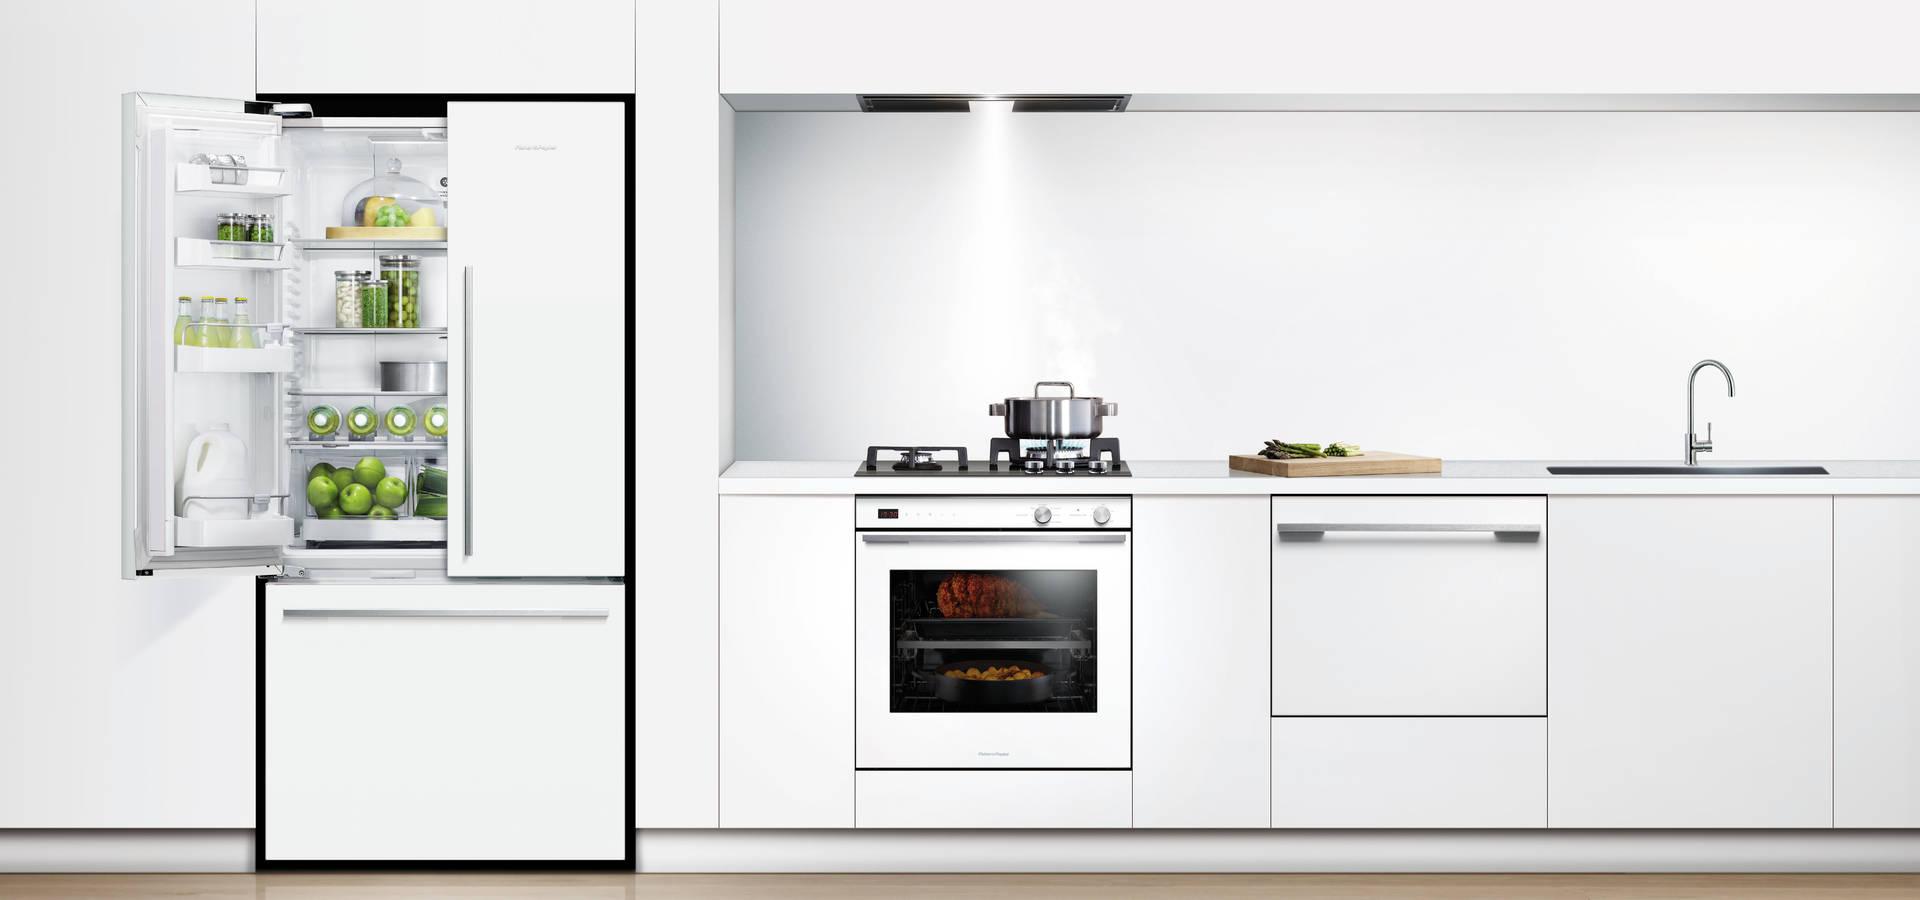 Fisher Paykel Appliances Ltd